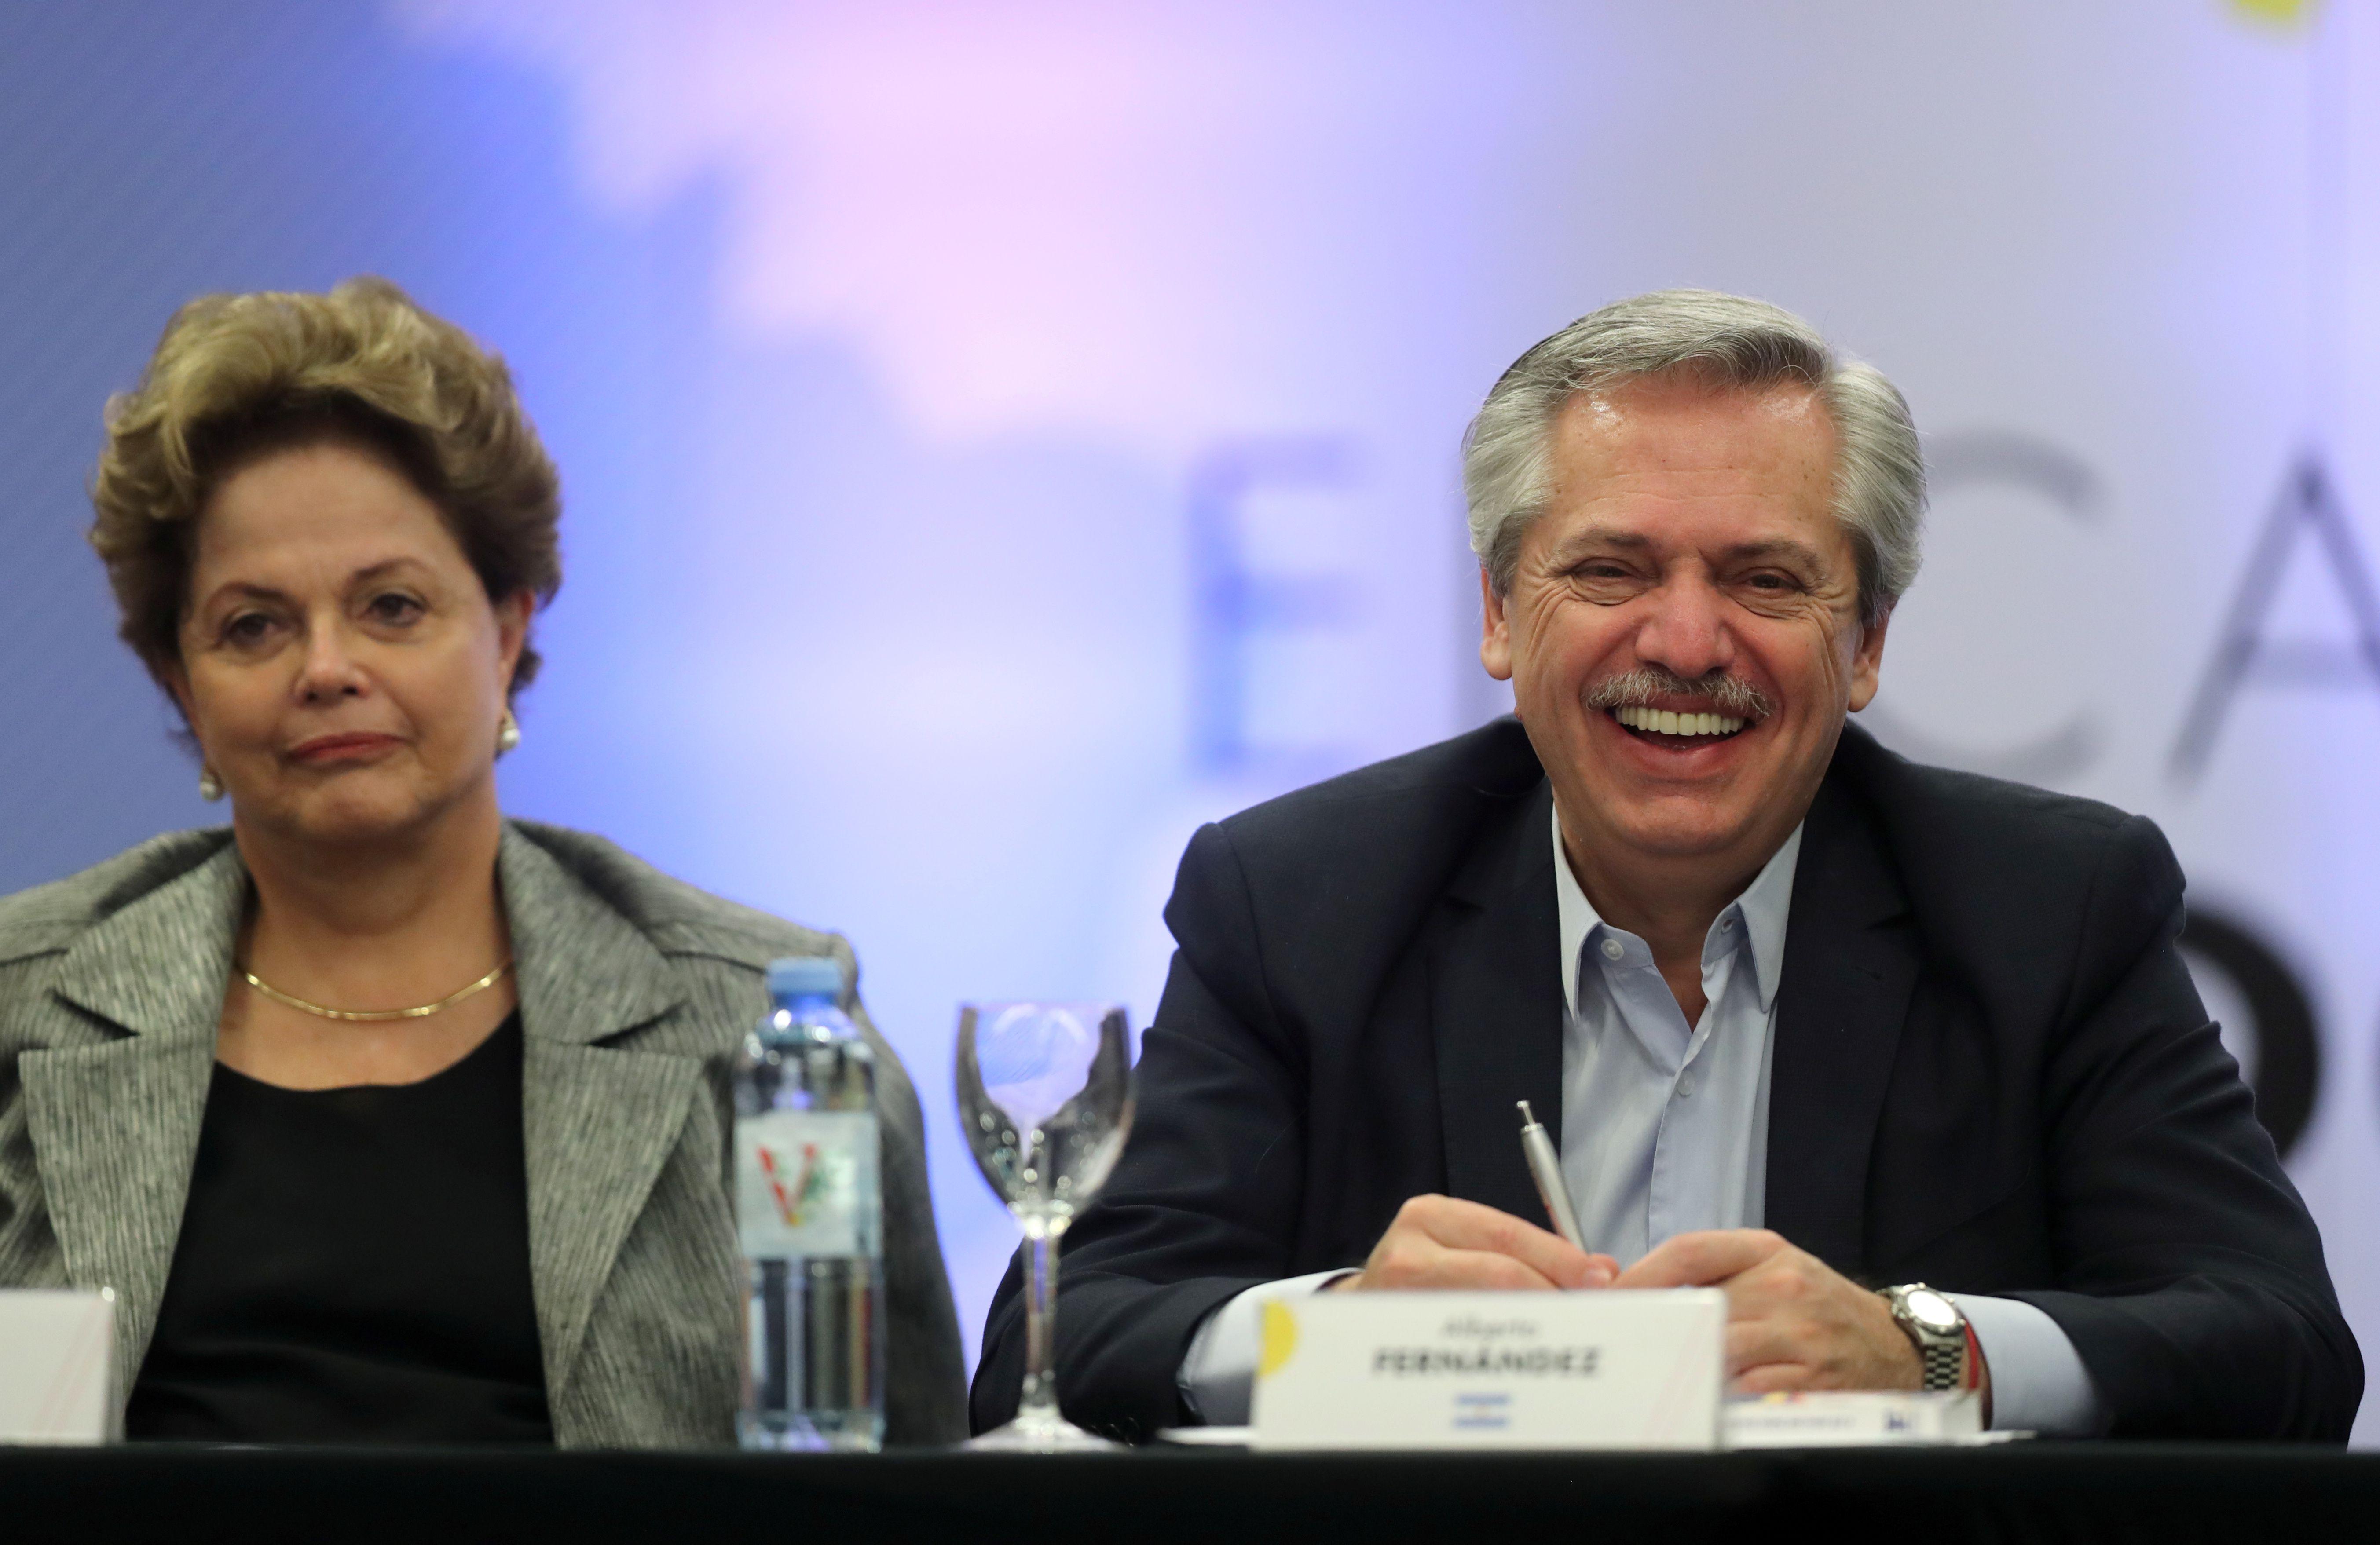 La liberación de Lula Da Silva en Brasil mostró a un Alberto Fernández muy distendido. (REUTERS/Agustin Marcarian)